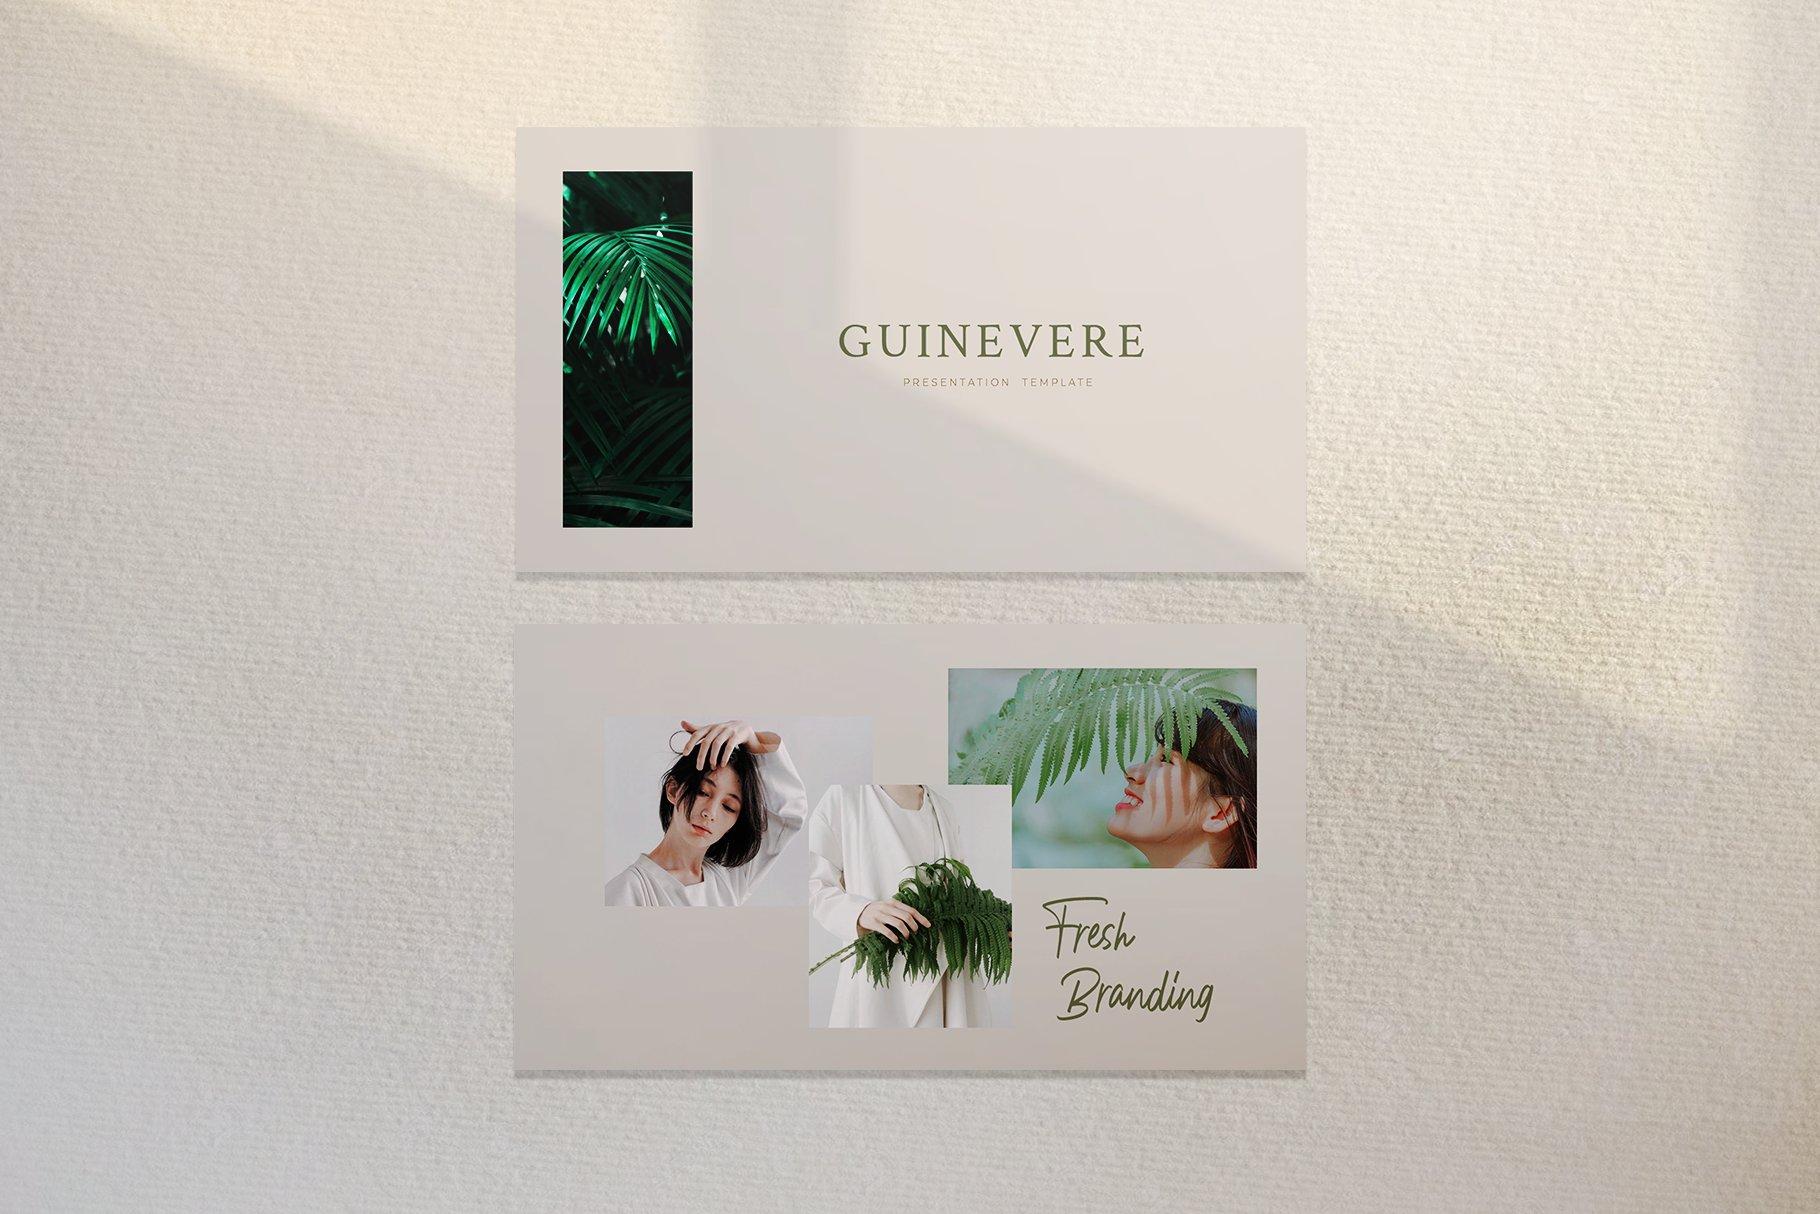 时尚品牌摄影作品集营销PPT幻灯片设计模板 Guinevere Presentation Template插图(7)